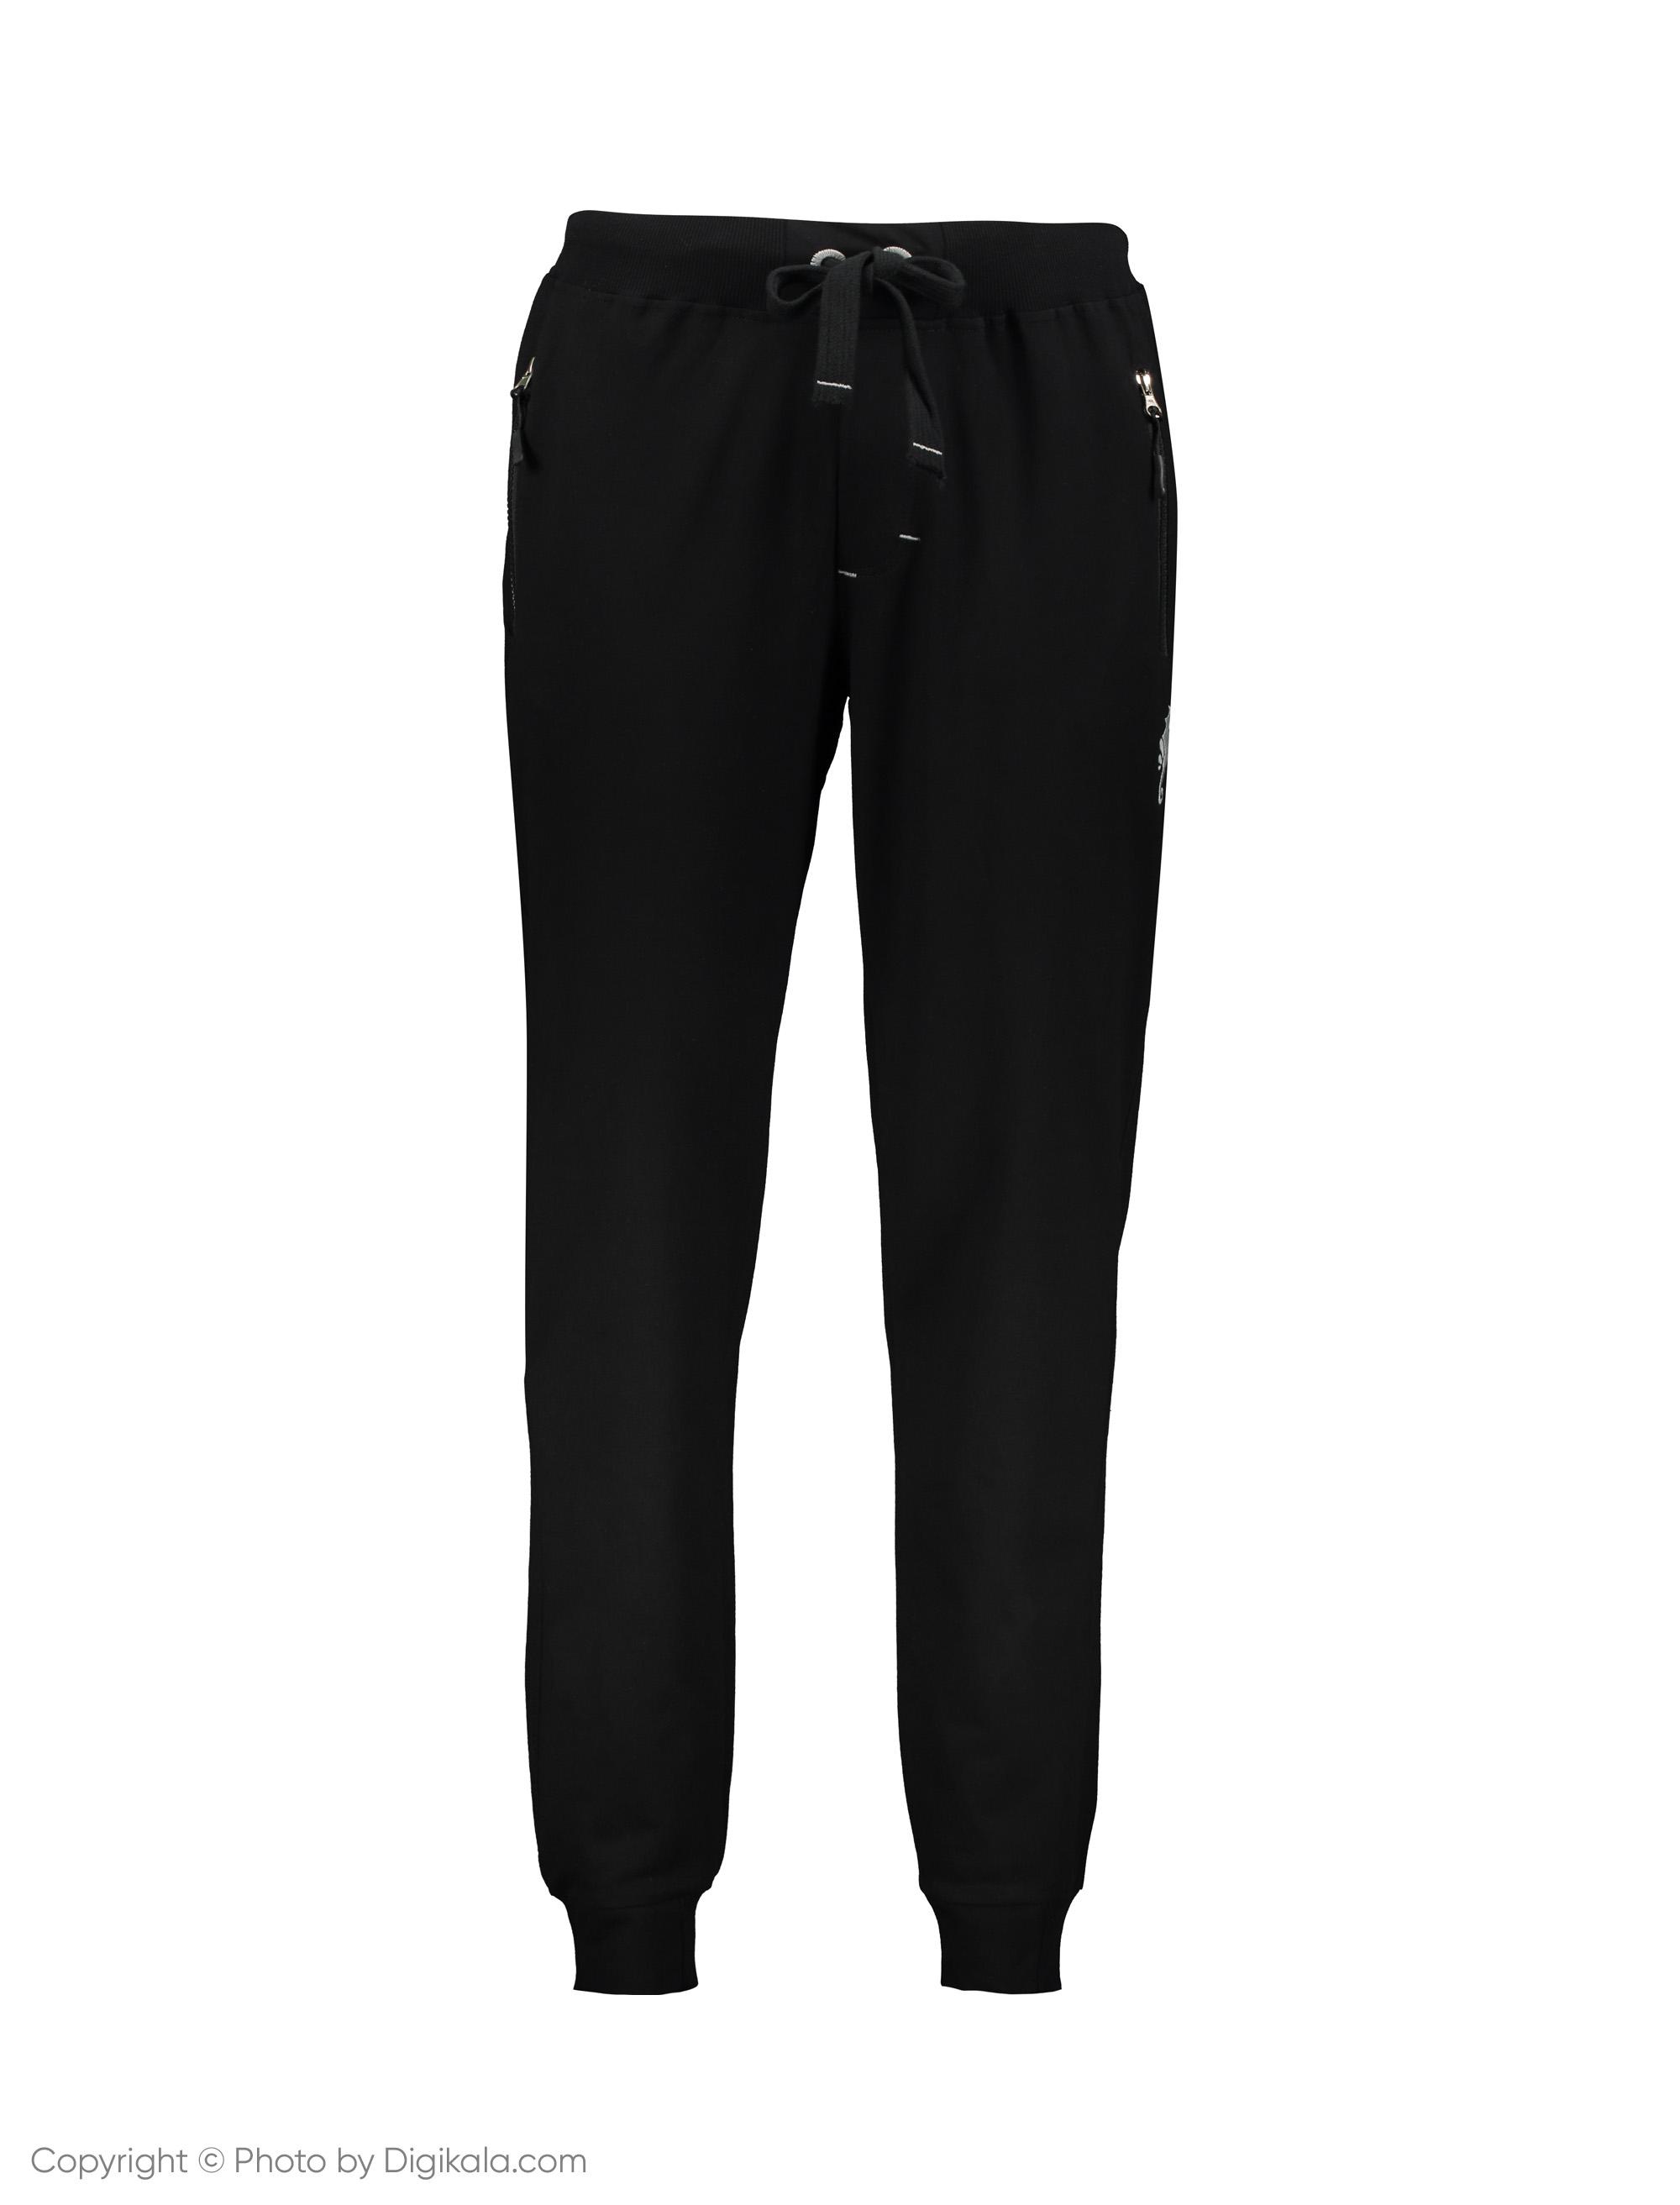 شلوار مردانه زی مدل 153110999  Zi 153110999 Trousers For Men